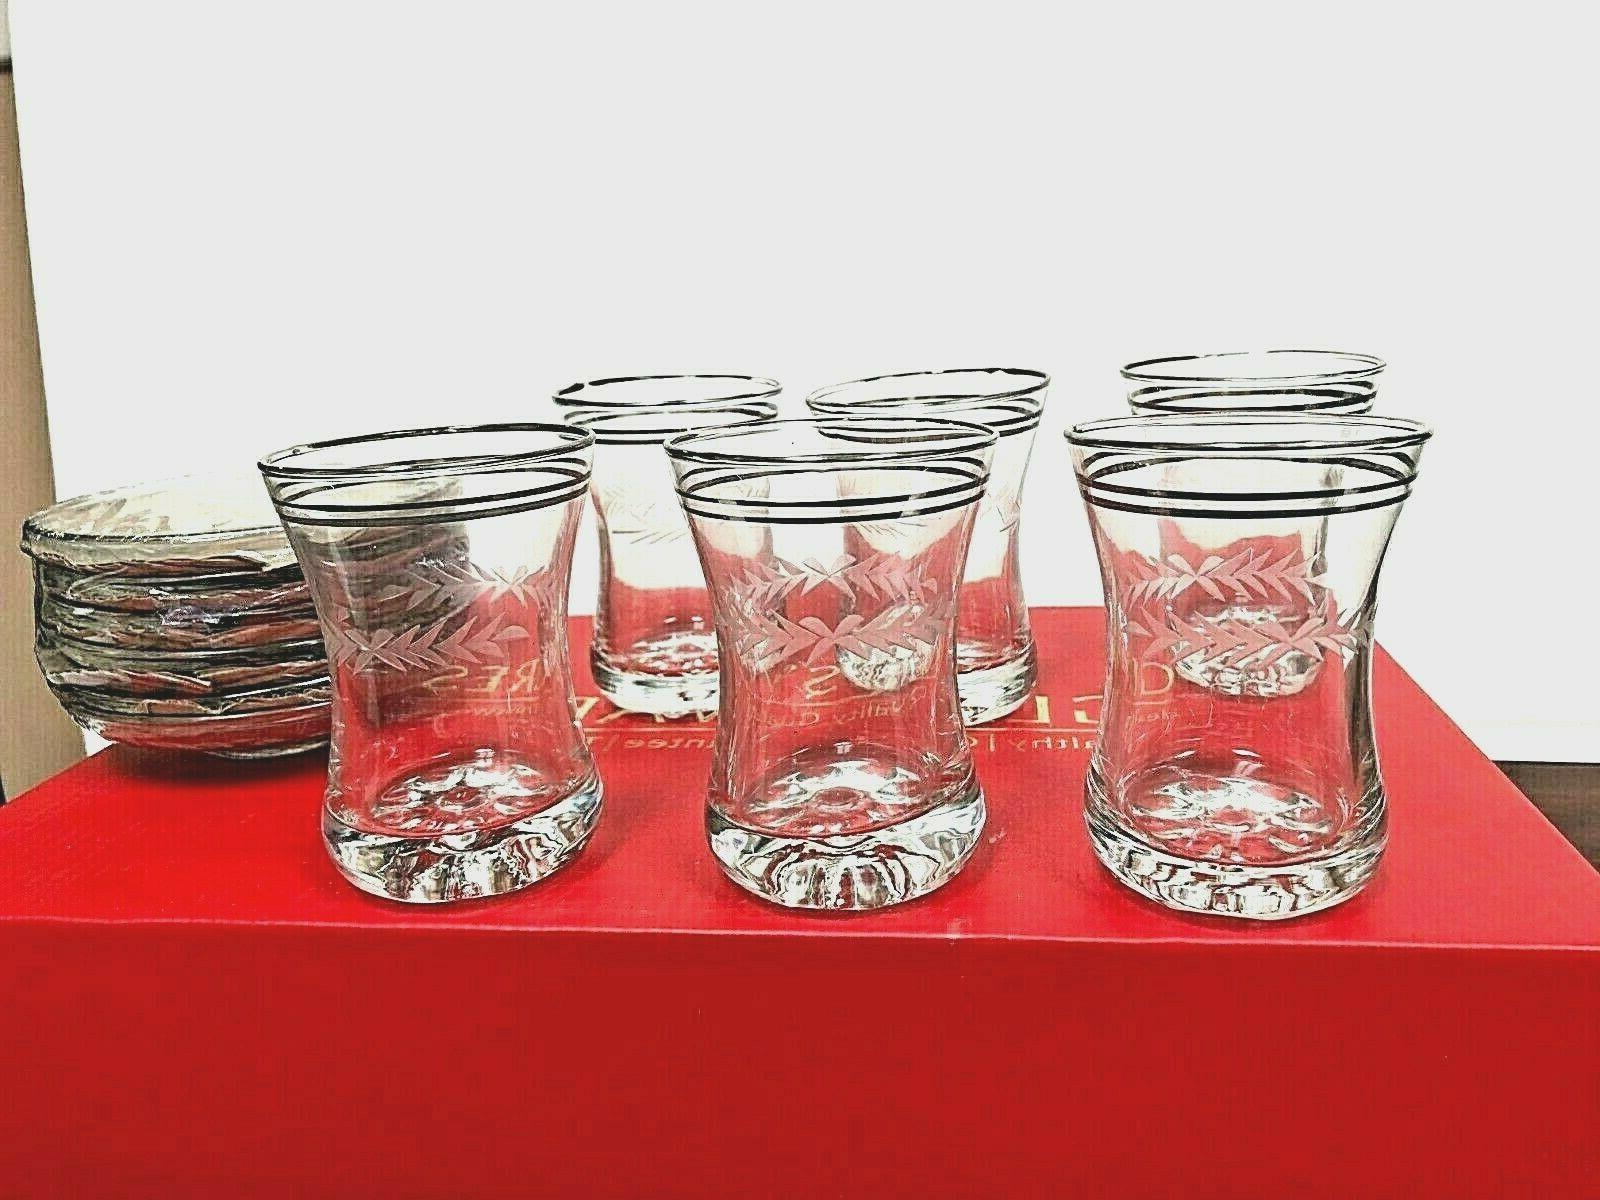 turkish tea glass set of 12 pcs